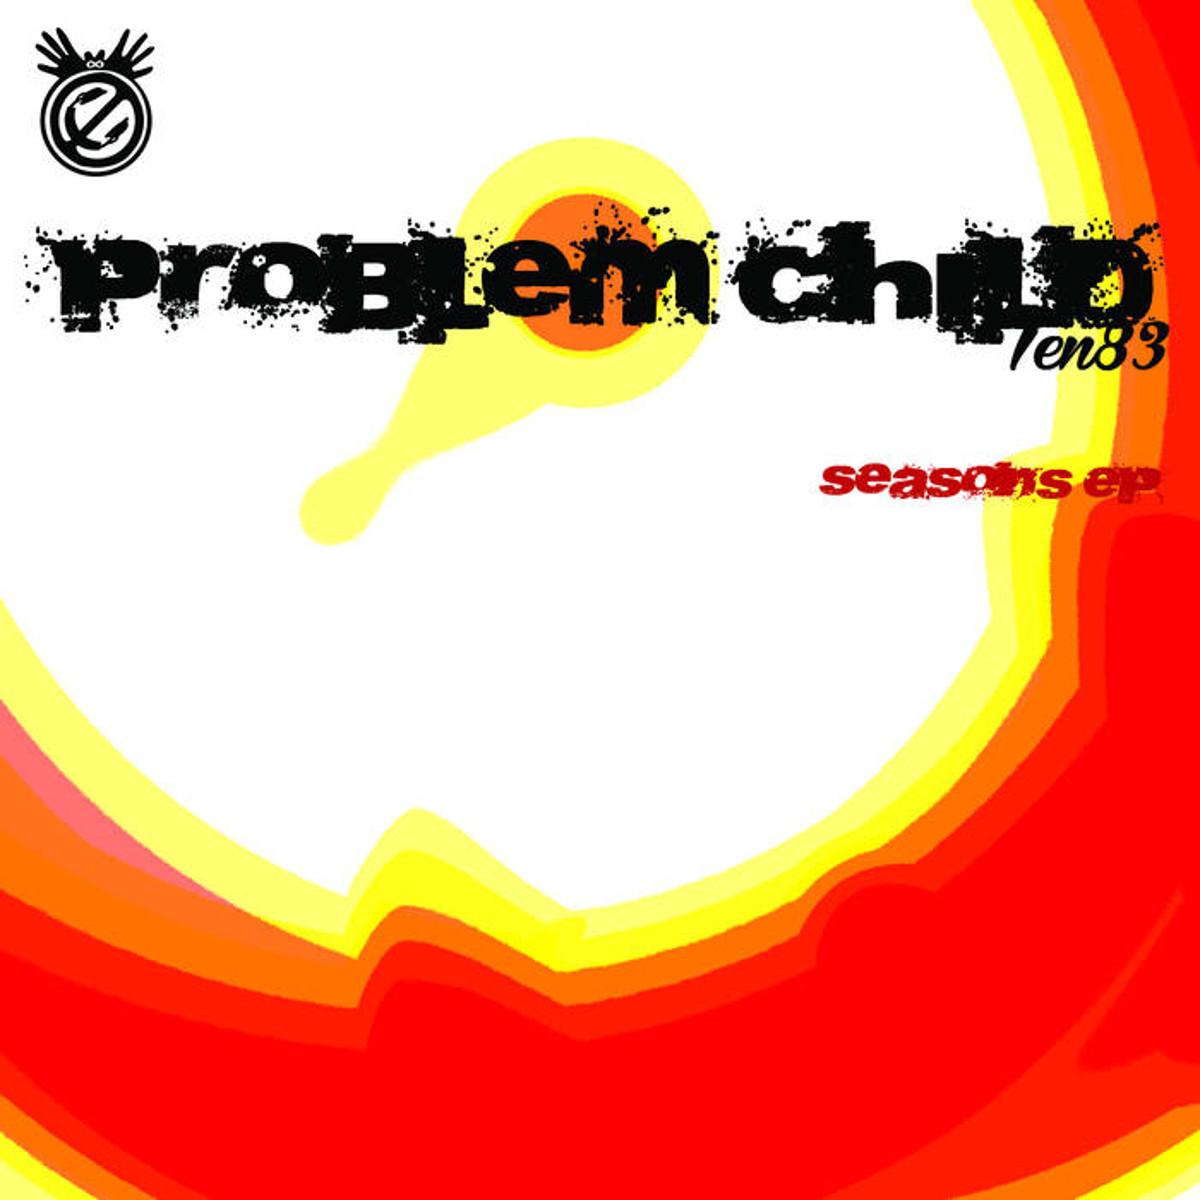 Problem Child Ten83 Seasons EP - EP:Problem Child Ten83 – Seasons